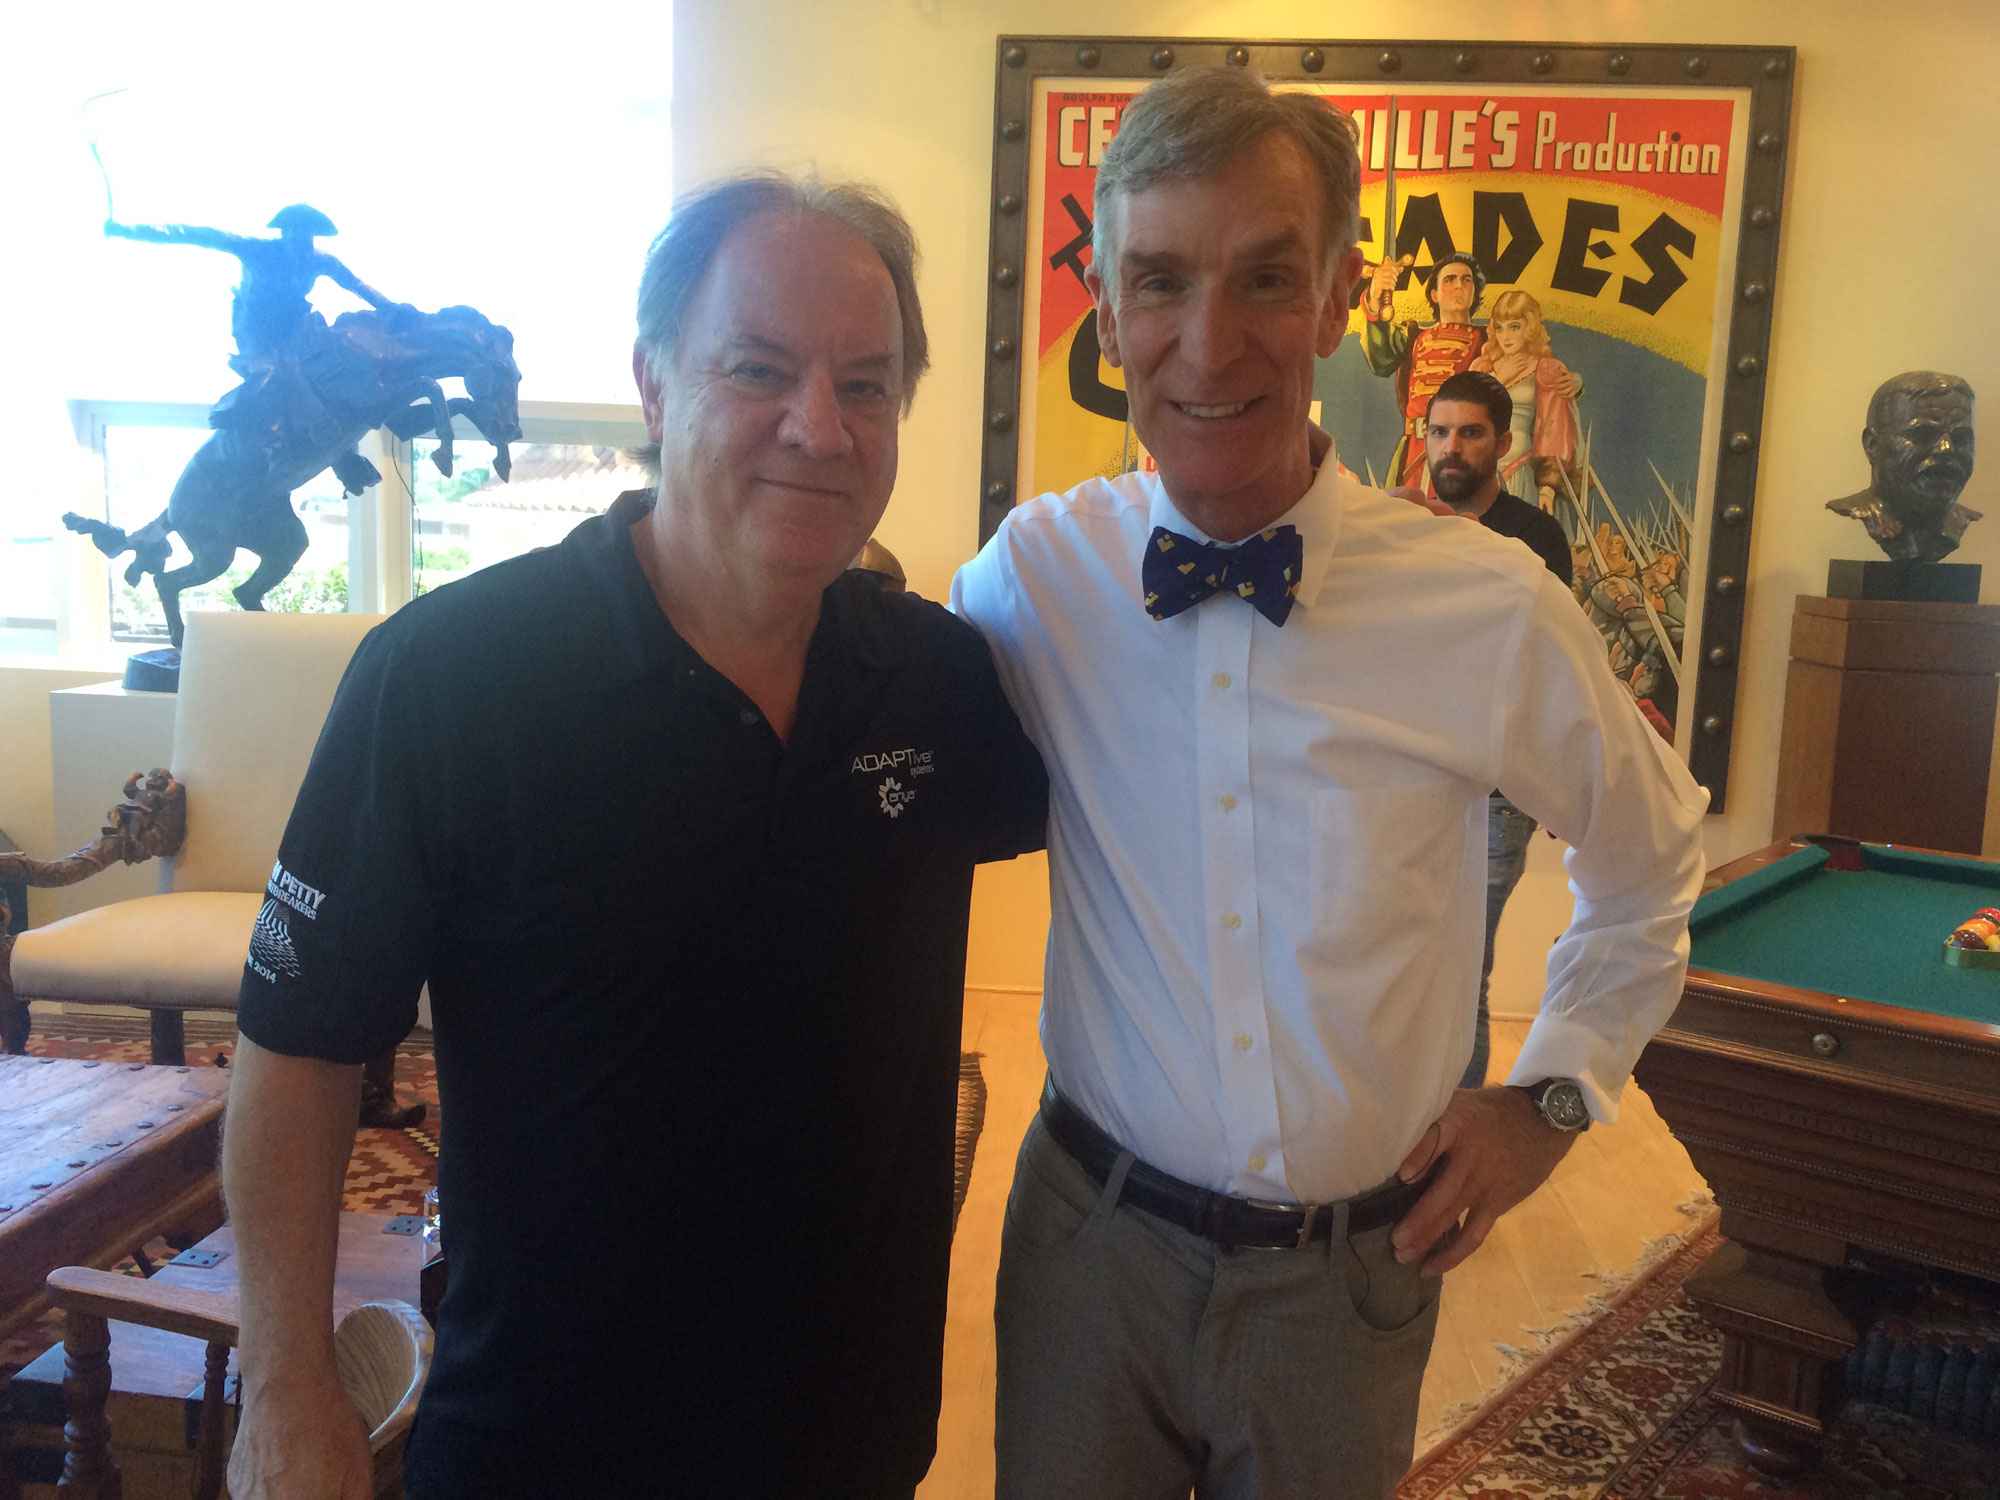 Mick Walker with Bill Nye